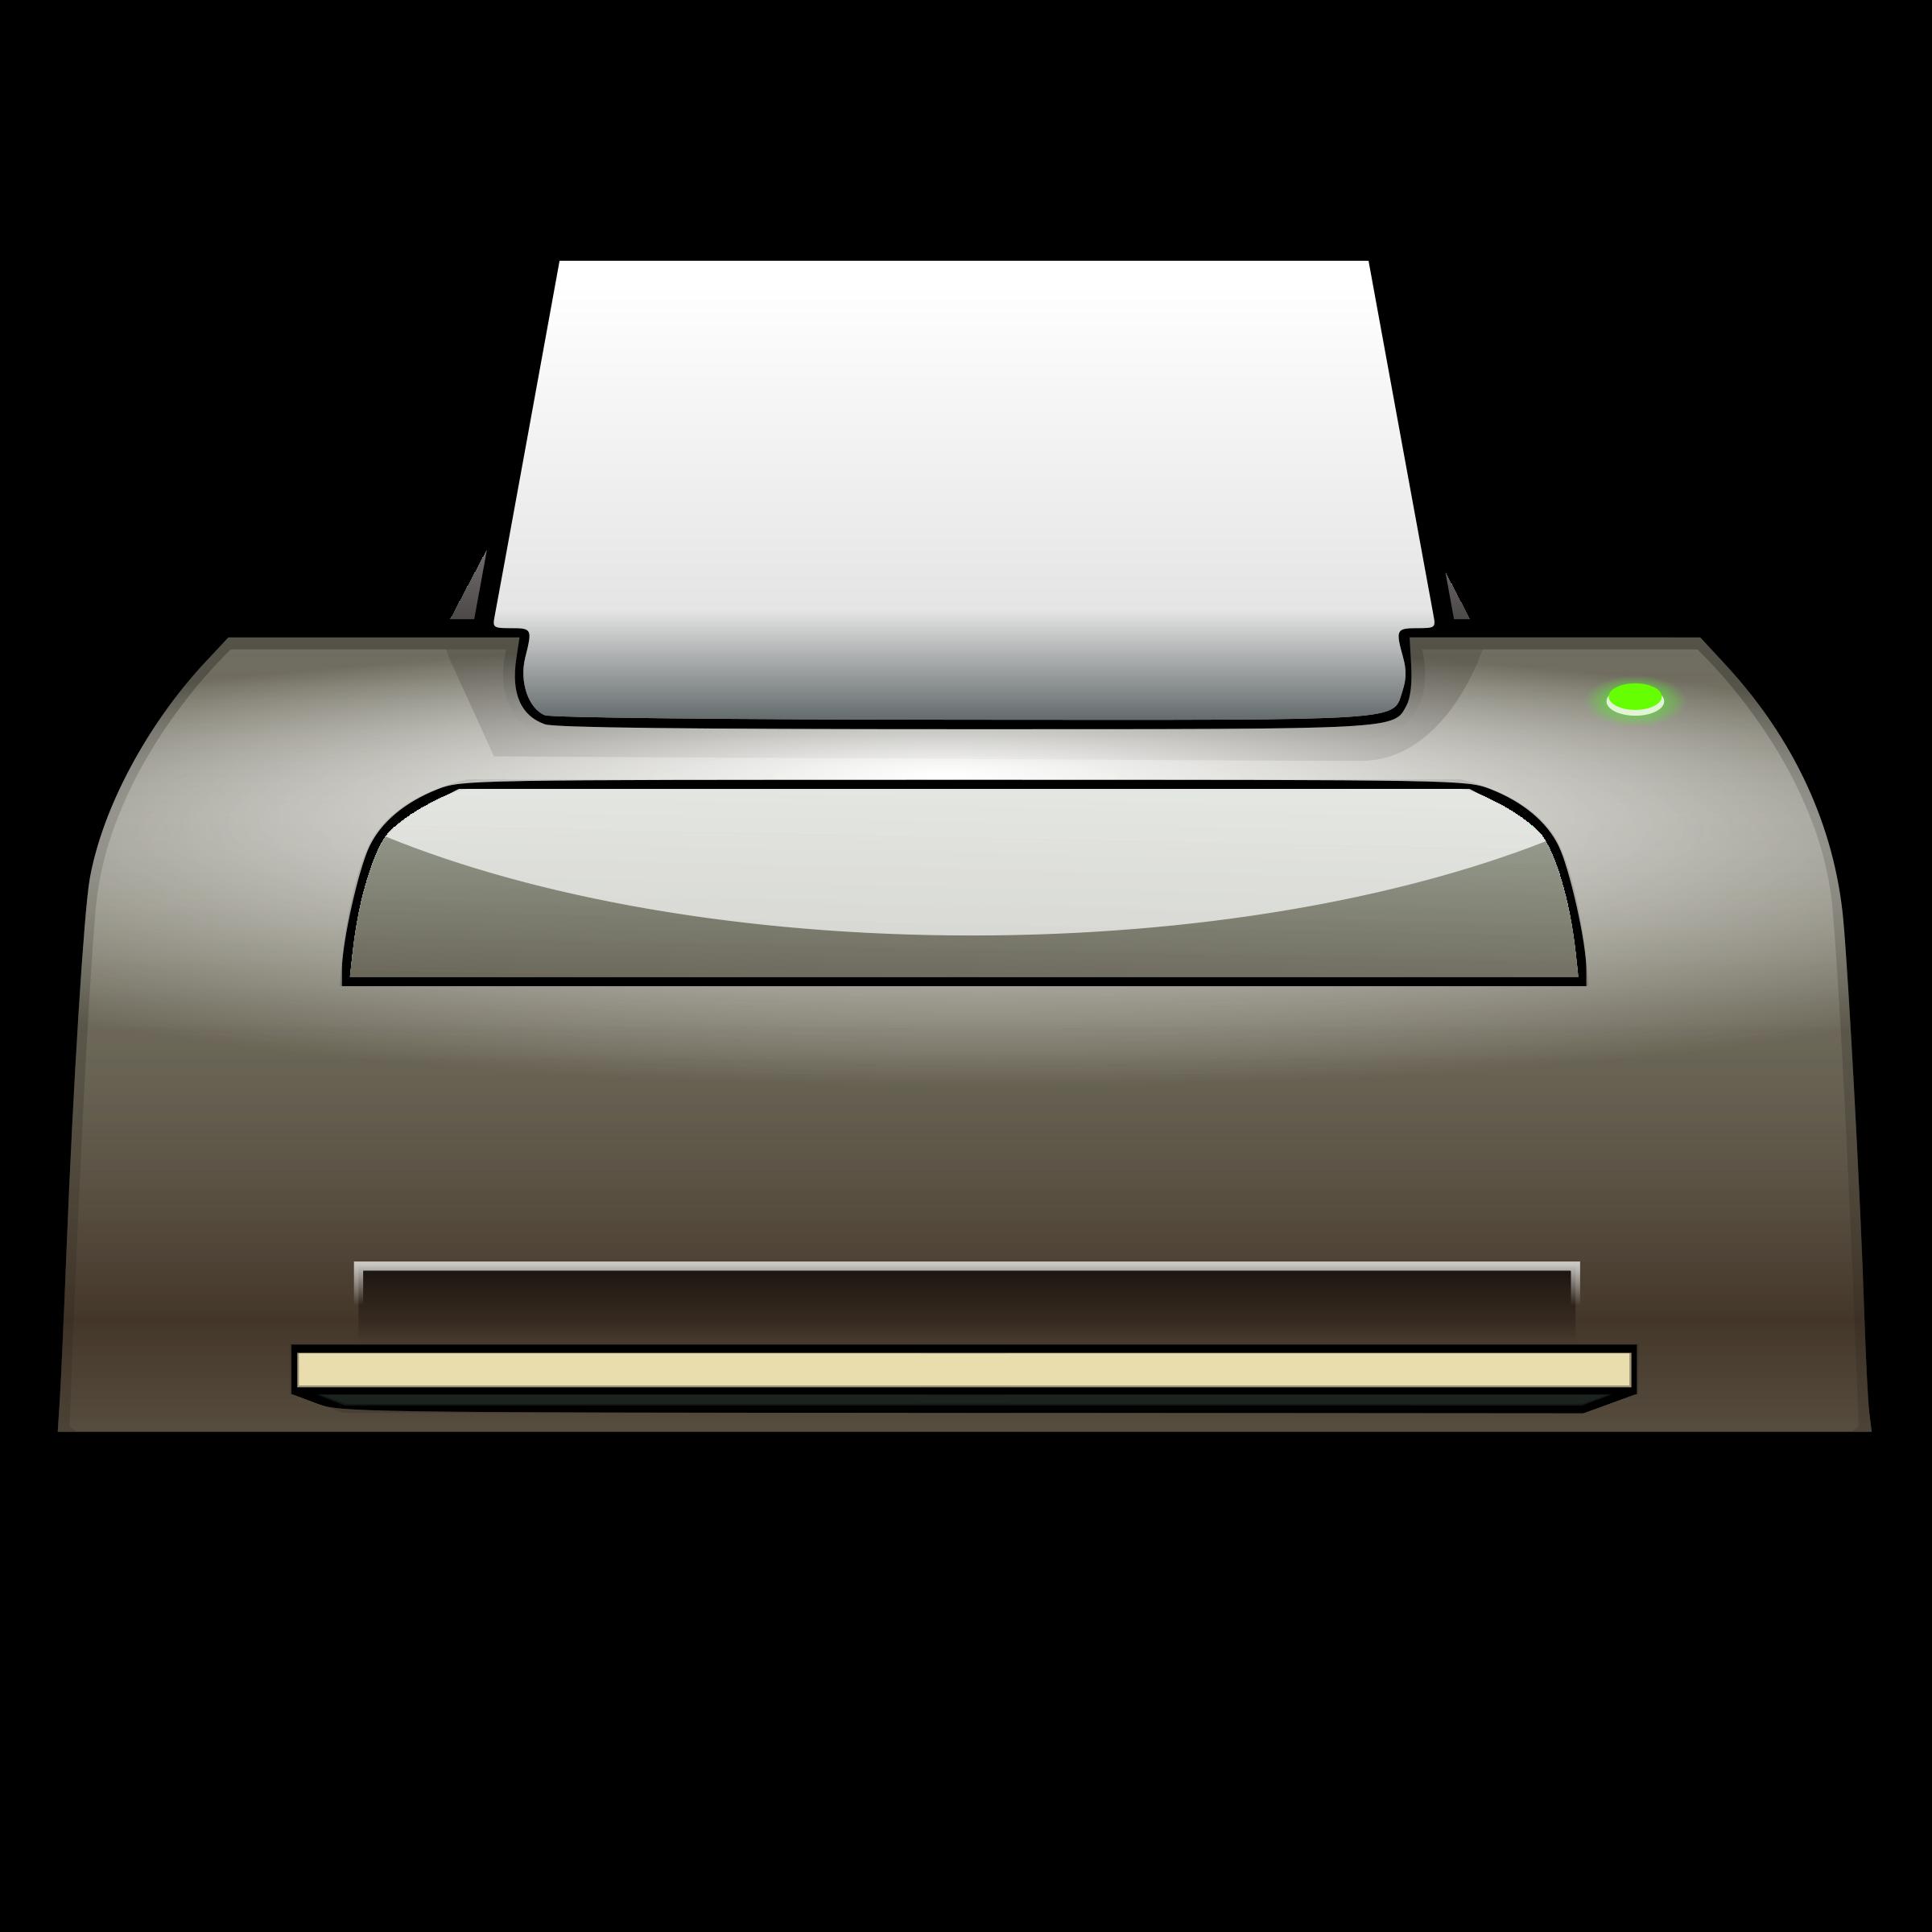 Computer Printer Clipart Clipart Panda F-Computer Printer Clipart Clipart Panda Free Clipart Images-1